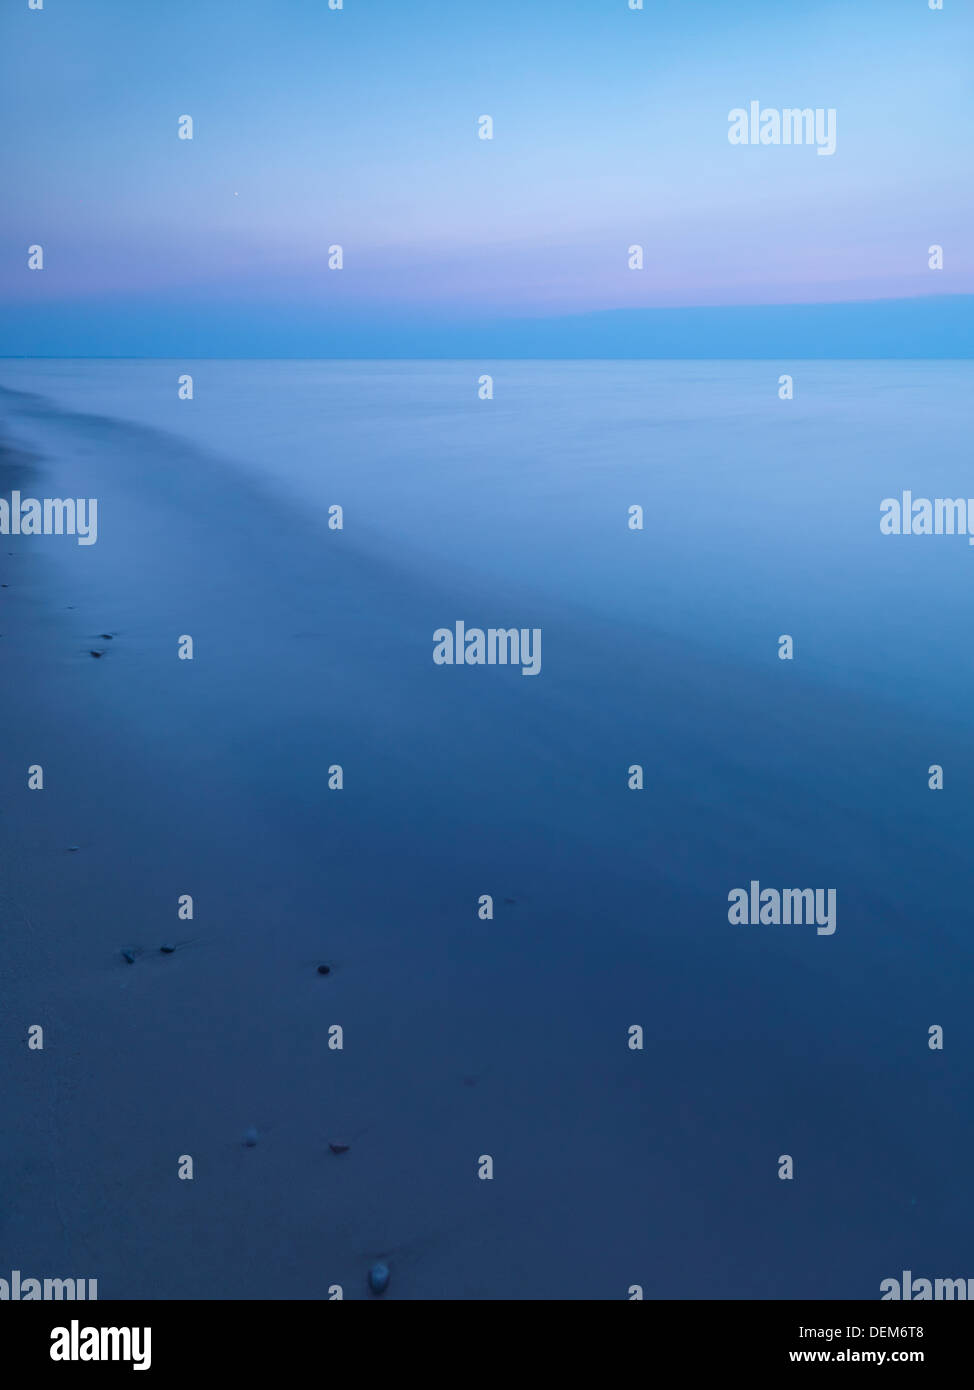 Calm tranquil twilight scenery of lake Huron, Ontario, Canada. - Stock Image